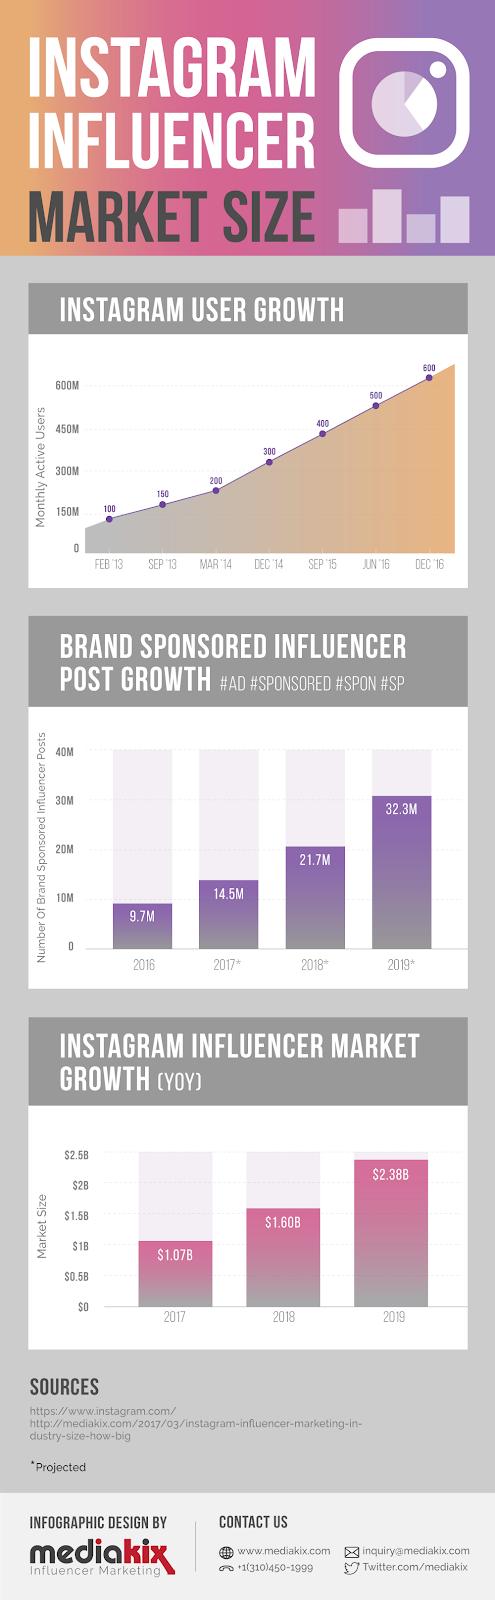 Instagram-Influencer-Marketing-Infographic-Industry-Market-Size